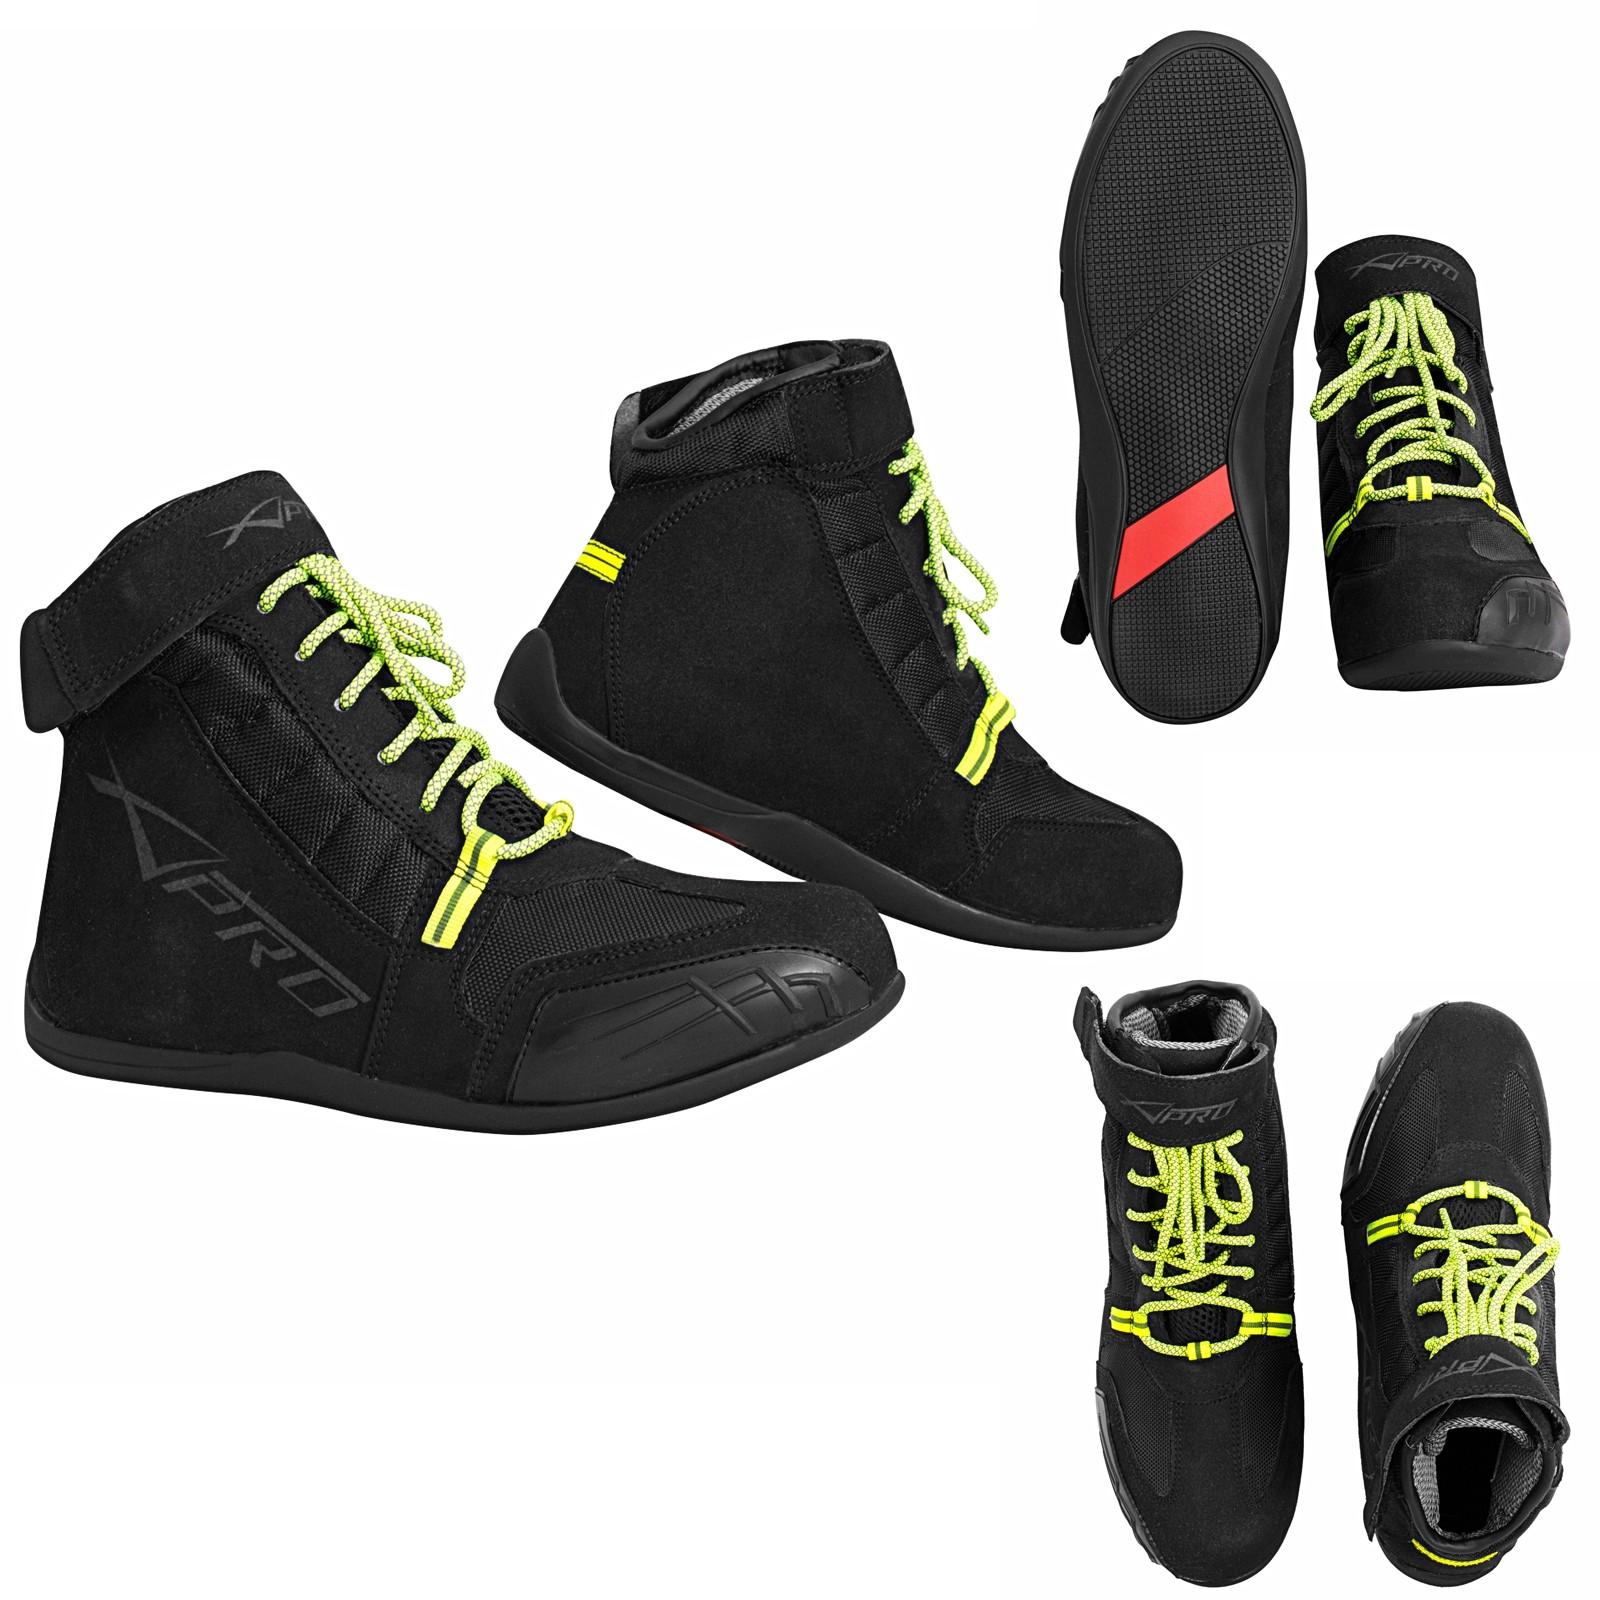 Drifter-Stivali-Boots-Motorcycle-Nero-Black-A-Pro-Sonic-Moto-Set